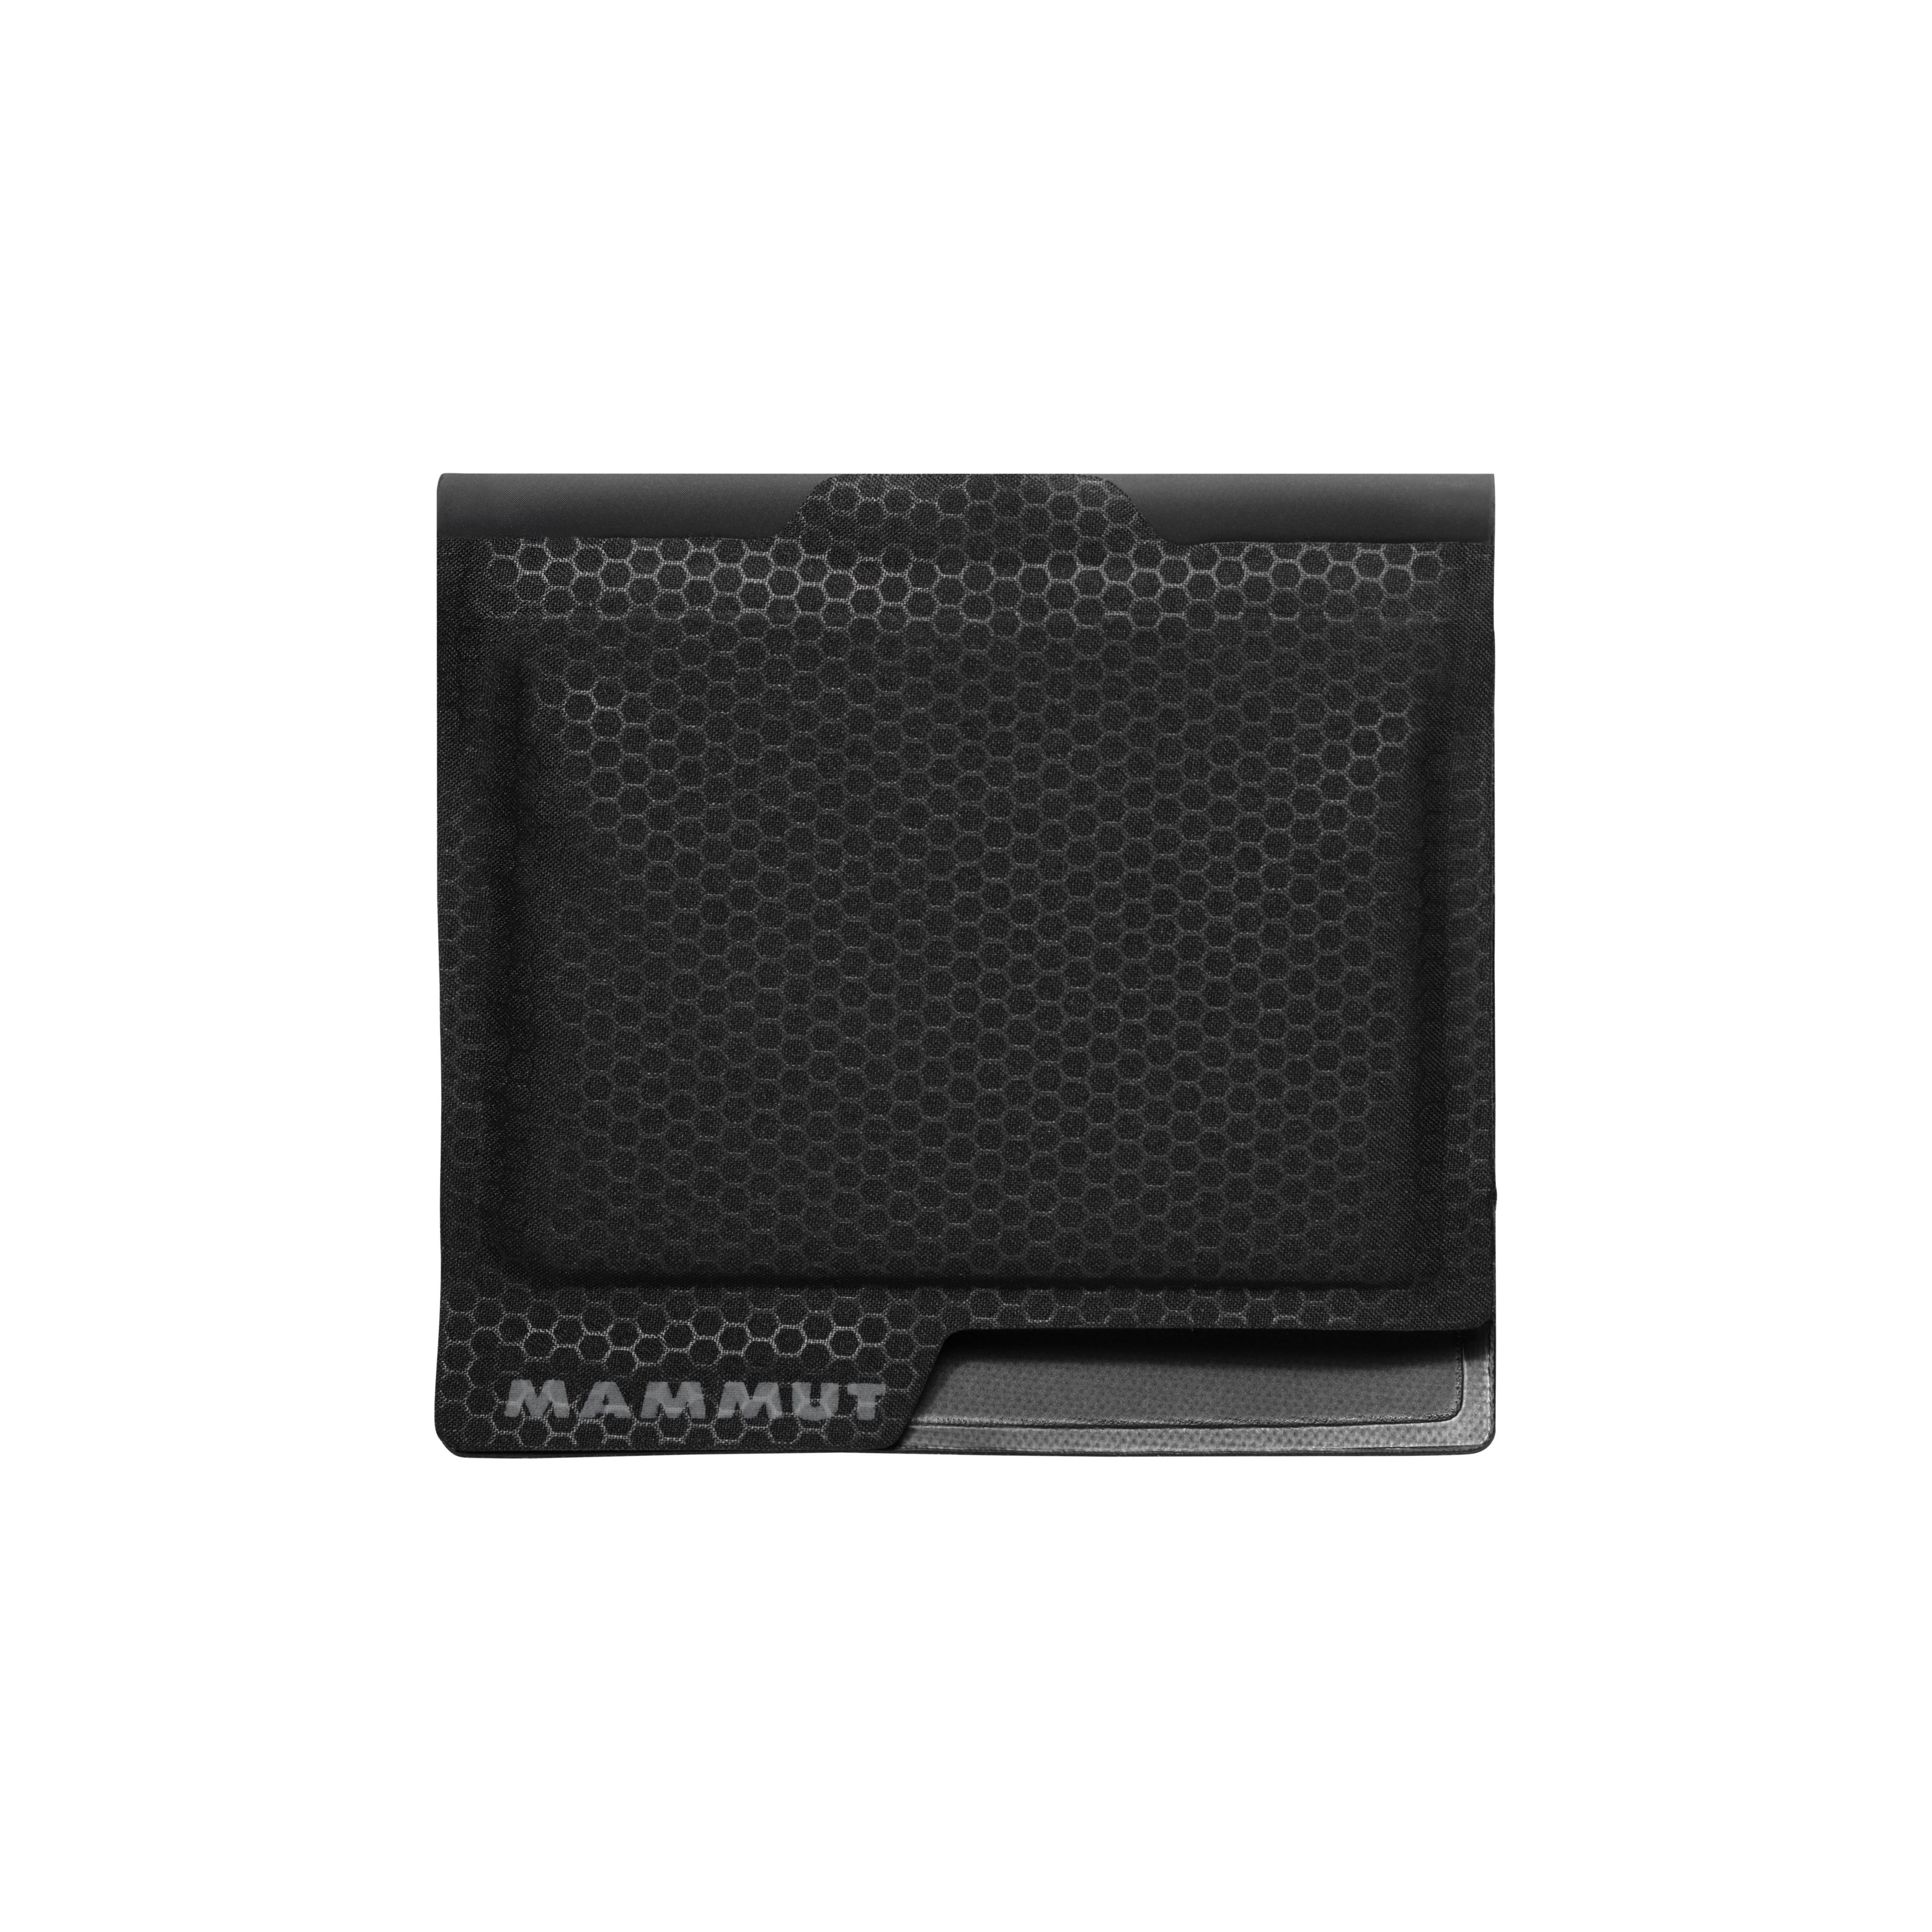 Smart Wallet Light - black, one size thumbnail